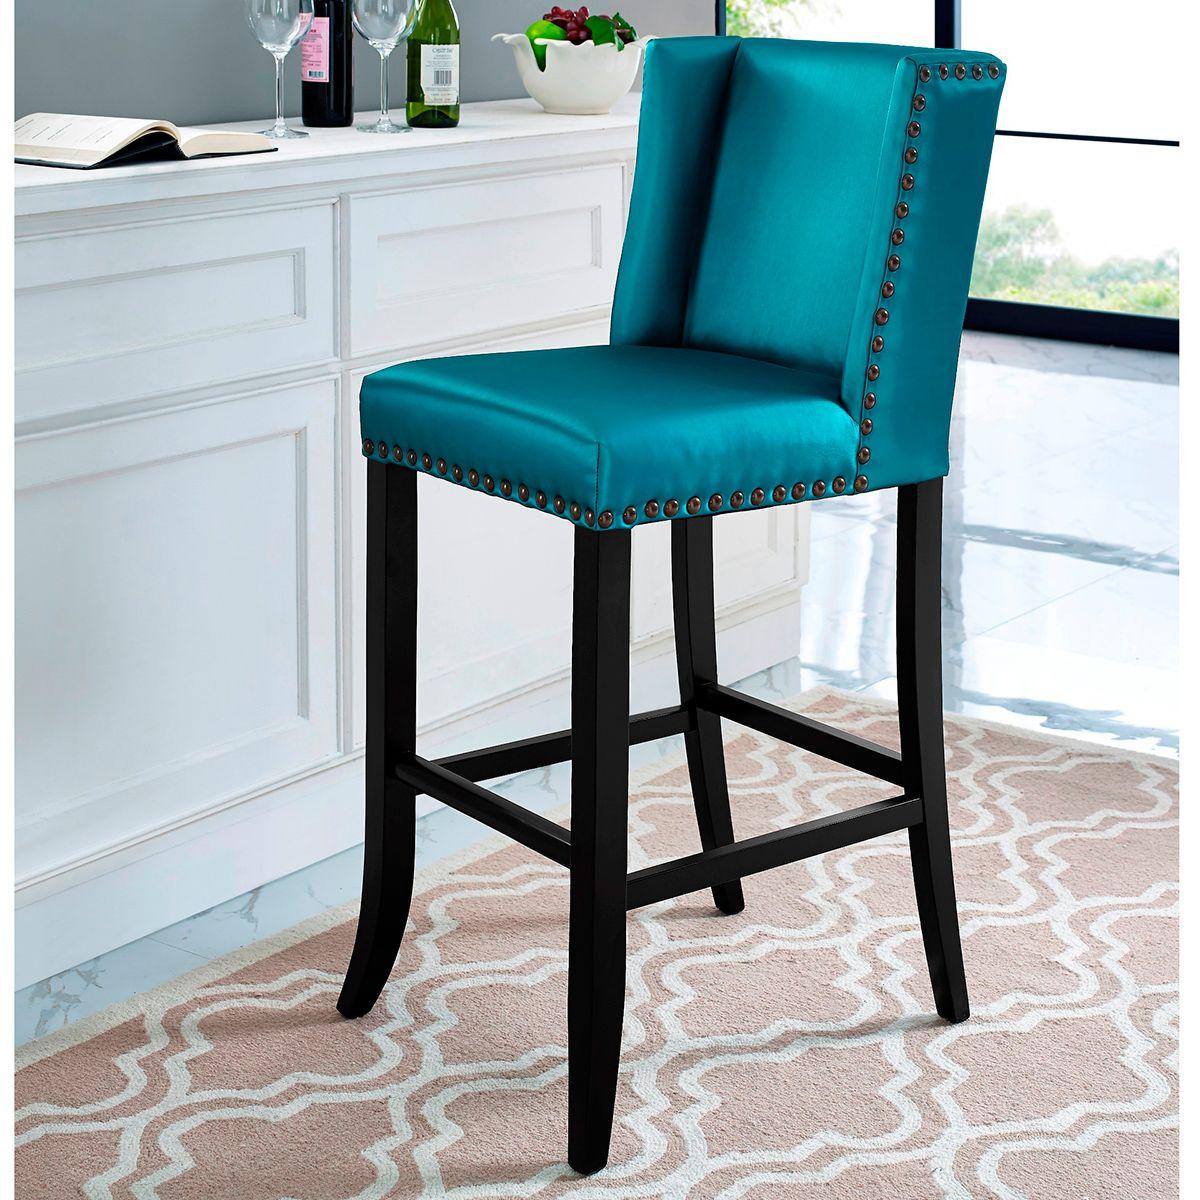 TOV Furniture Denver Blue Counter Stool w/ Bronze Nailhead | Counter ...